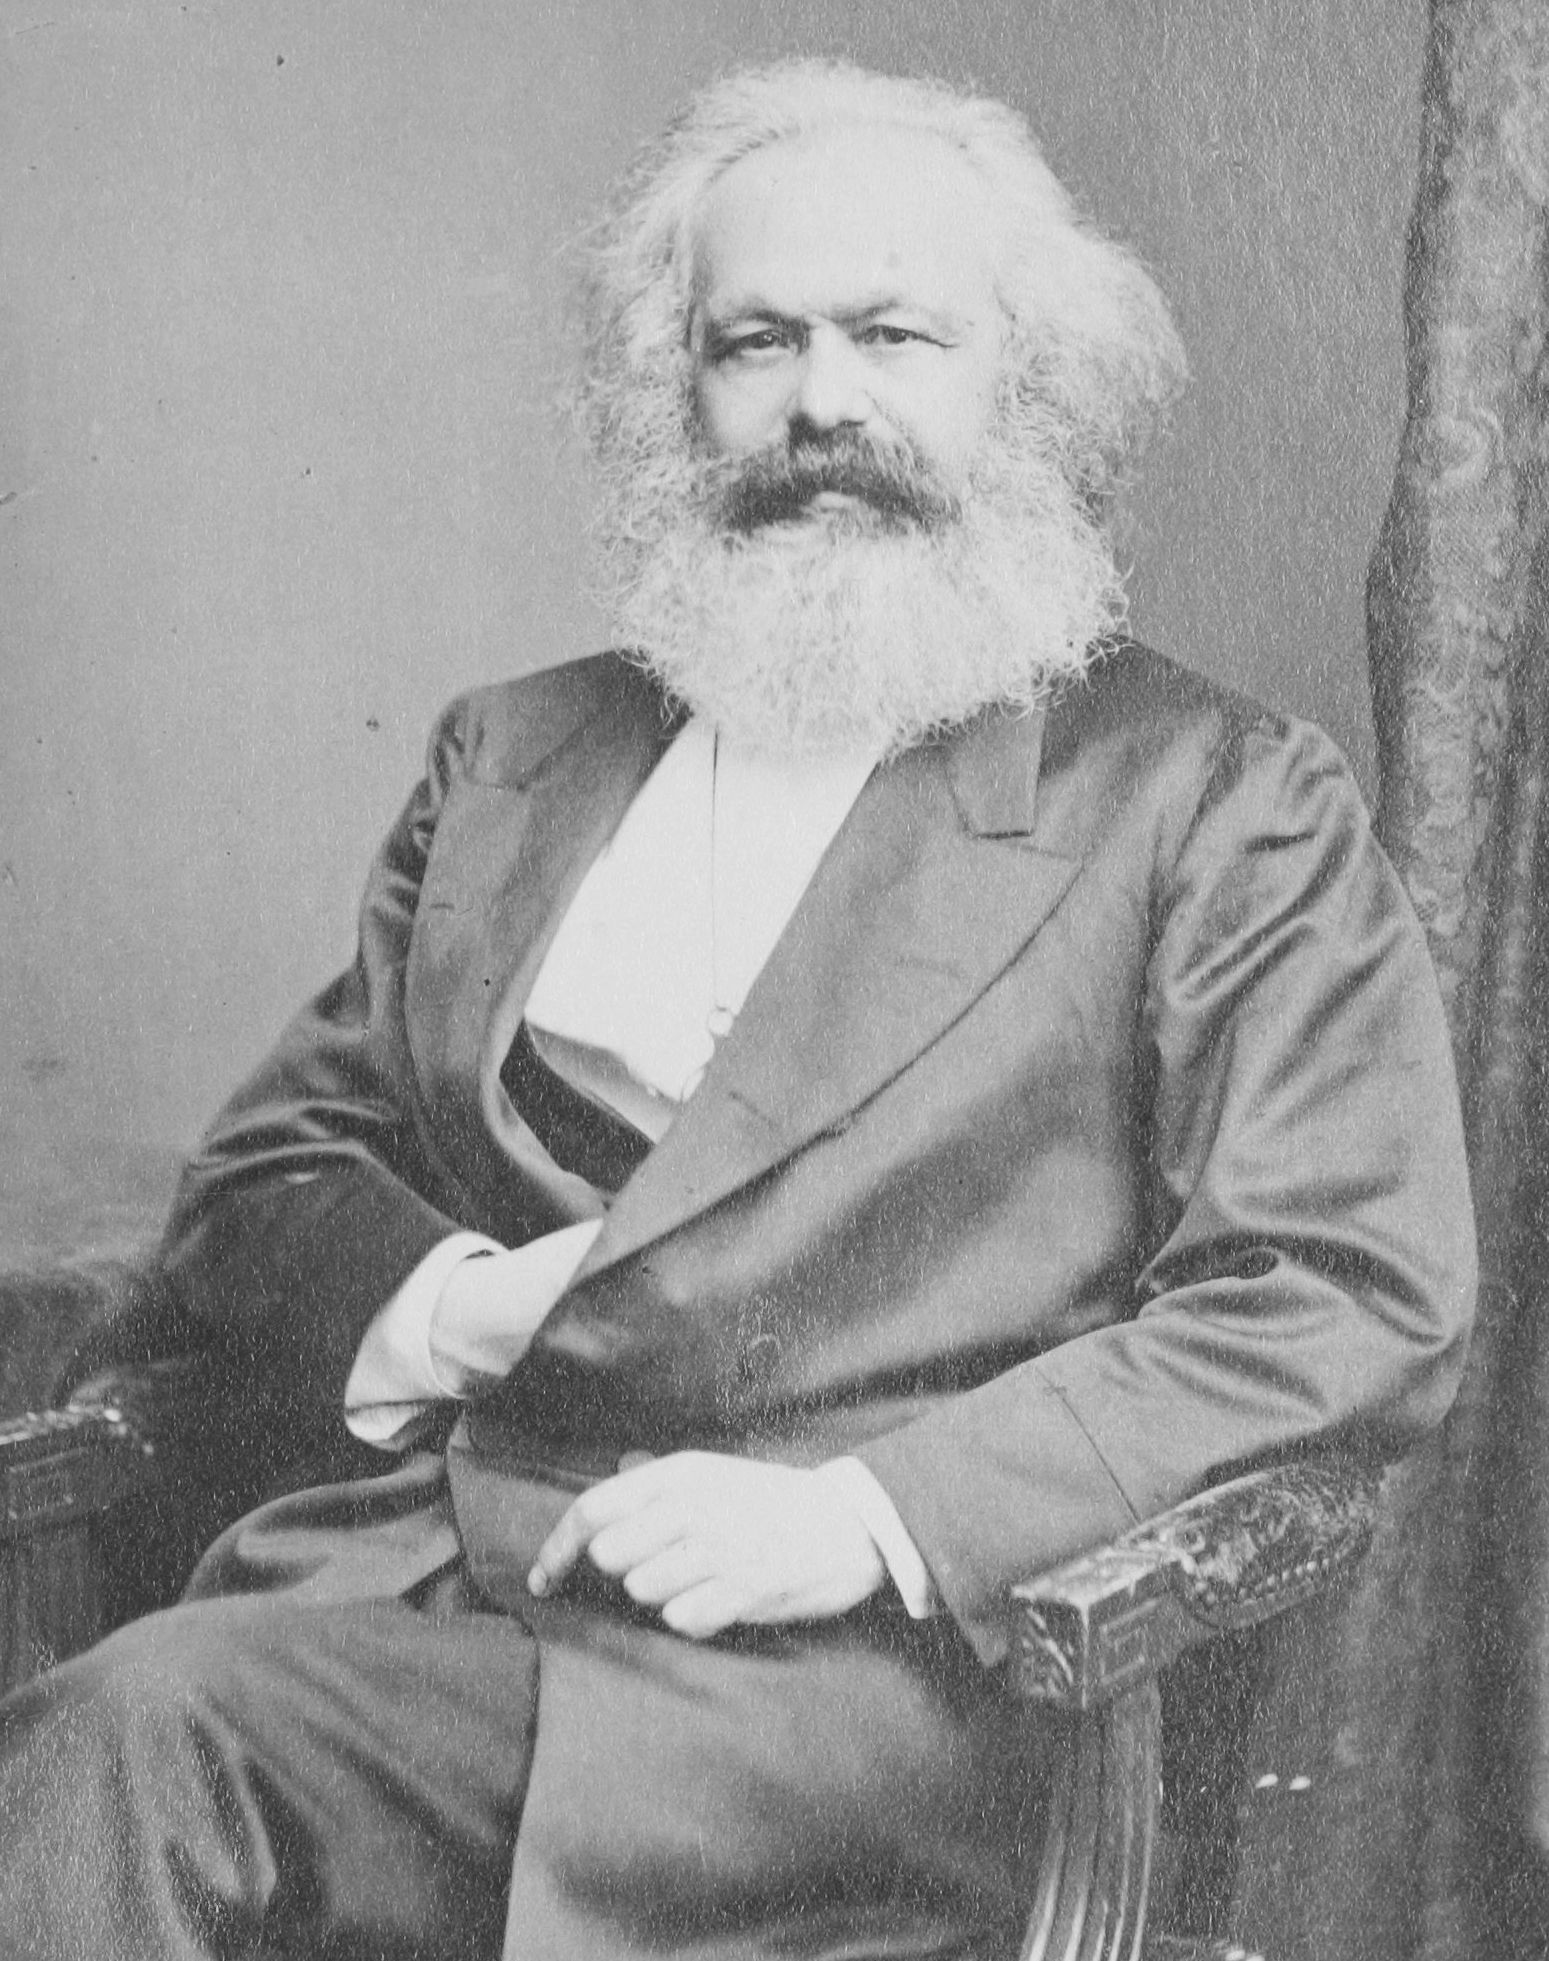 Photograph by English photographer, John Jabez Edwin Mayall (1813-1901). Digital copy from the VanGoYourself.com Web site.